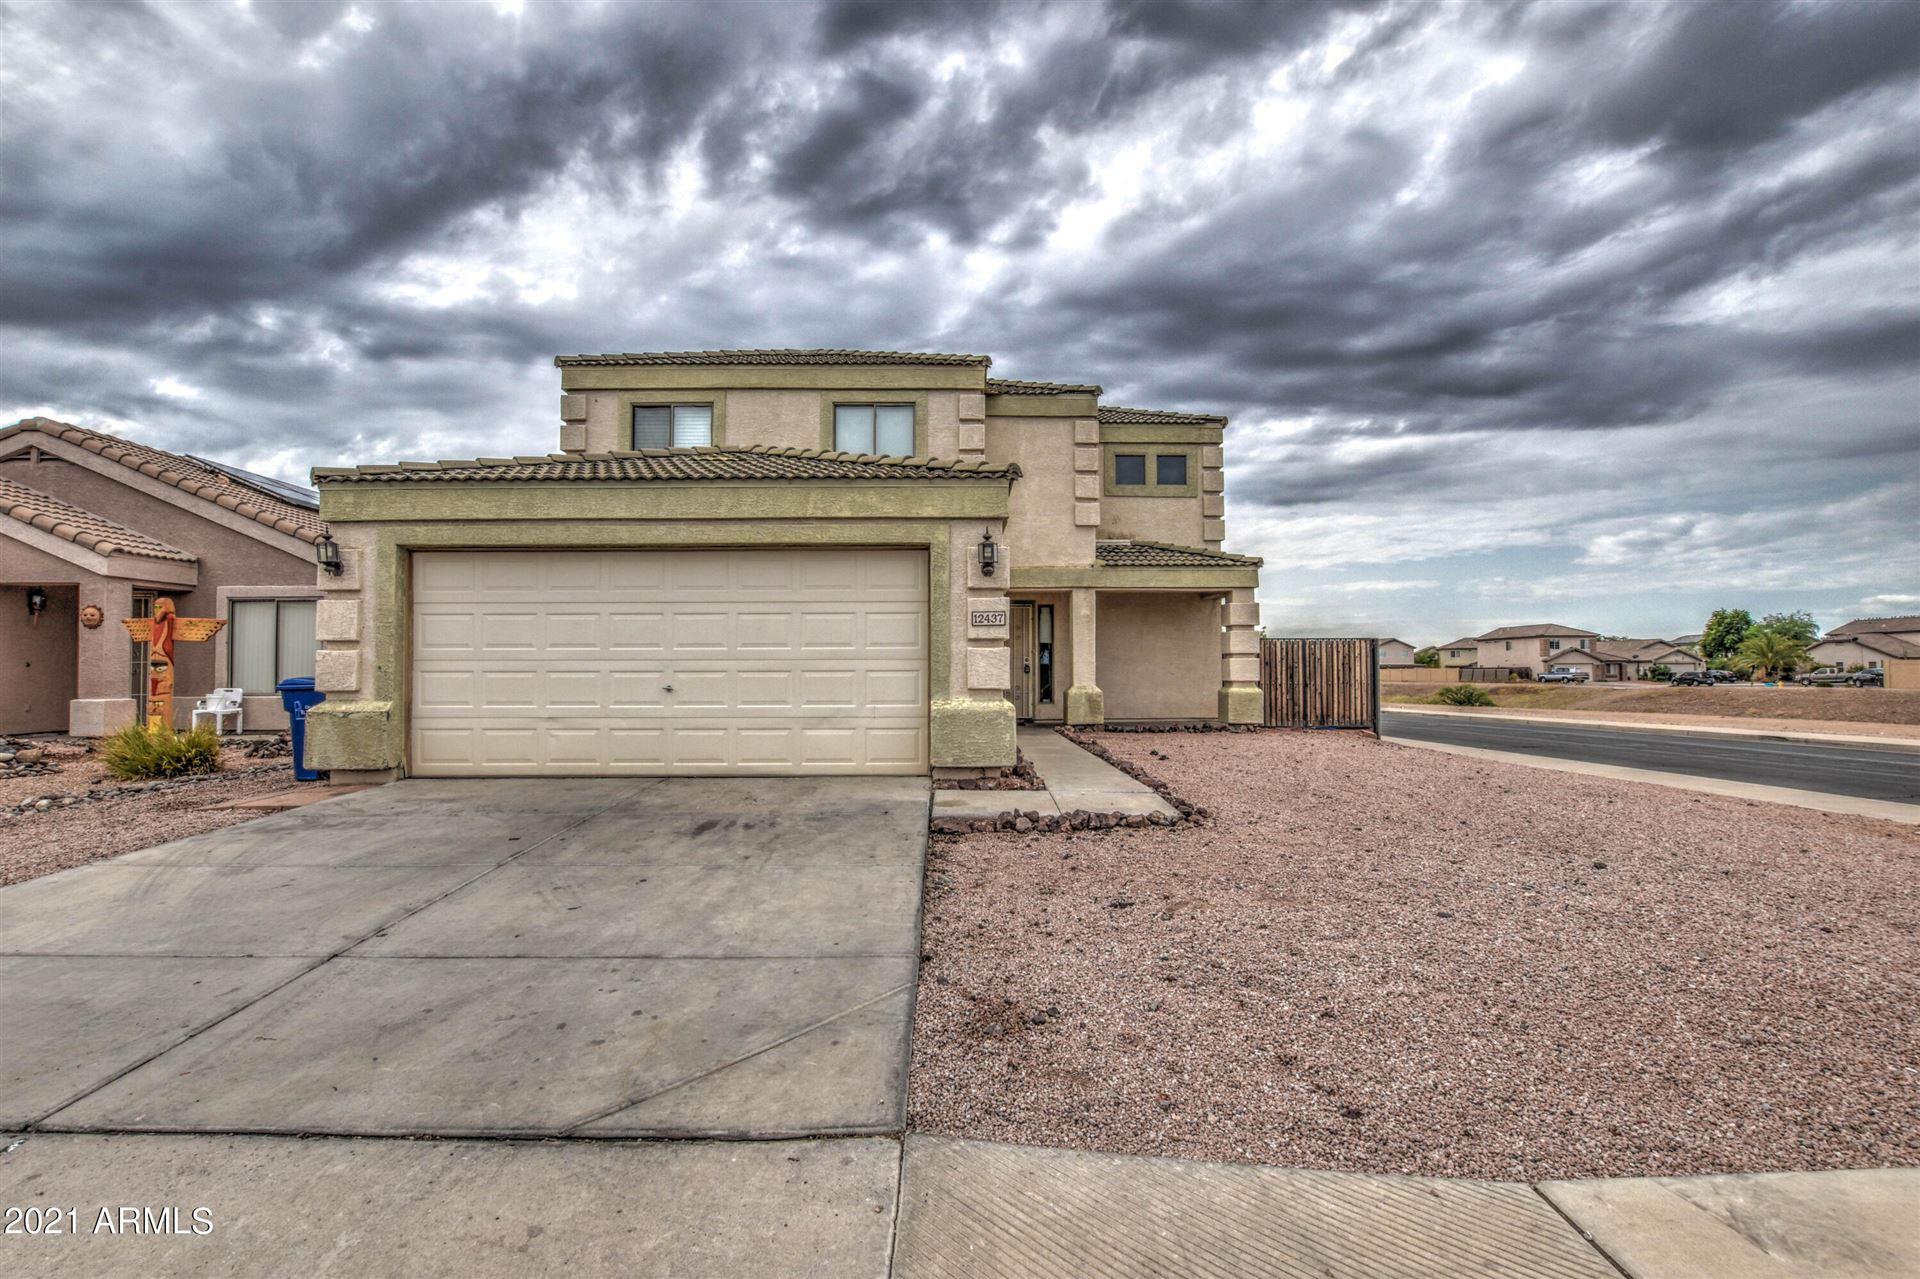 Photo of 12437 W ASTER Drive, El Mirage, AZ 85335 (MLS # 6300229)